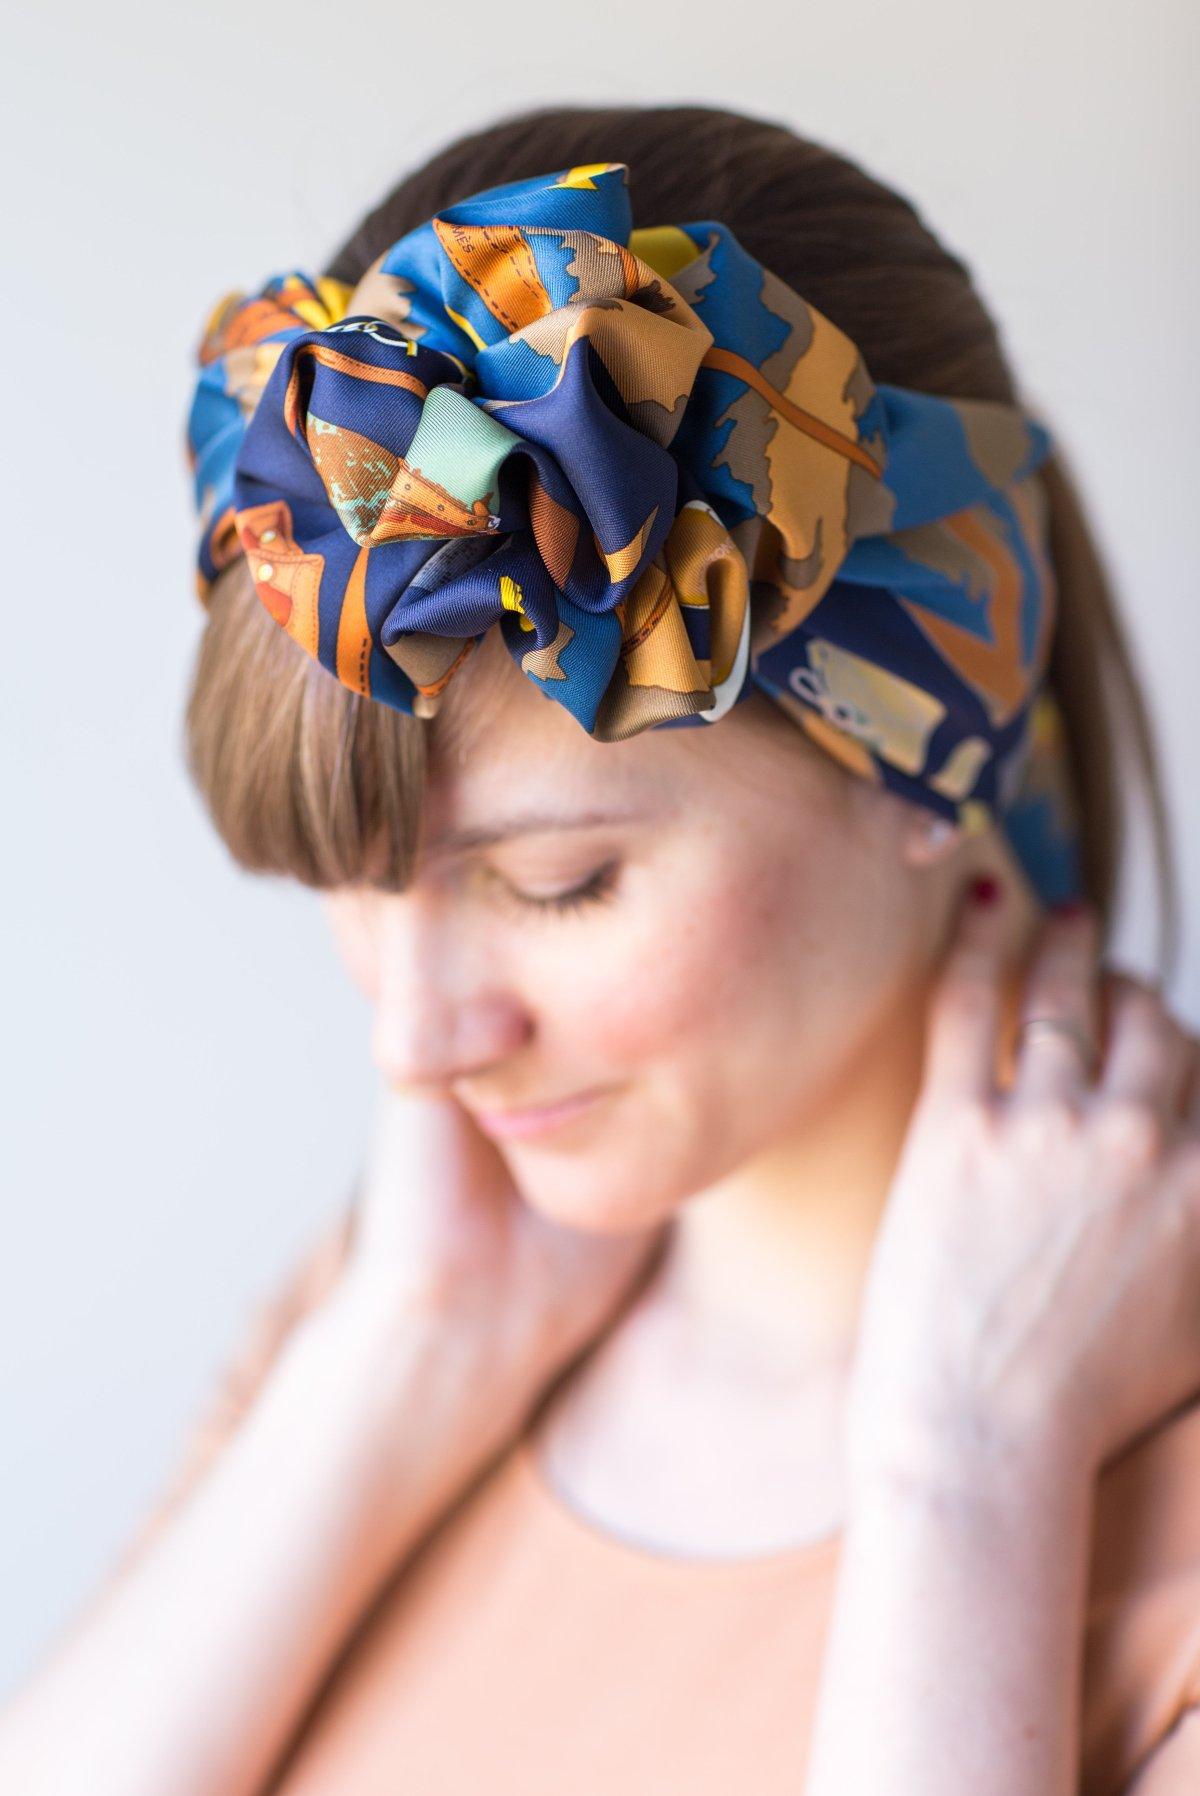 Monsieur et Madame II, Hermes, scarf, knots, headband, carre, Эрмес, платок, карре, Как красиво завязать платок, Hermes Schal